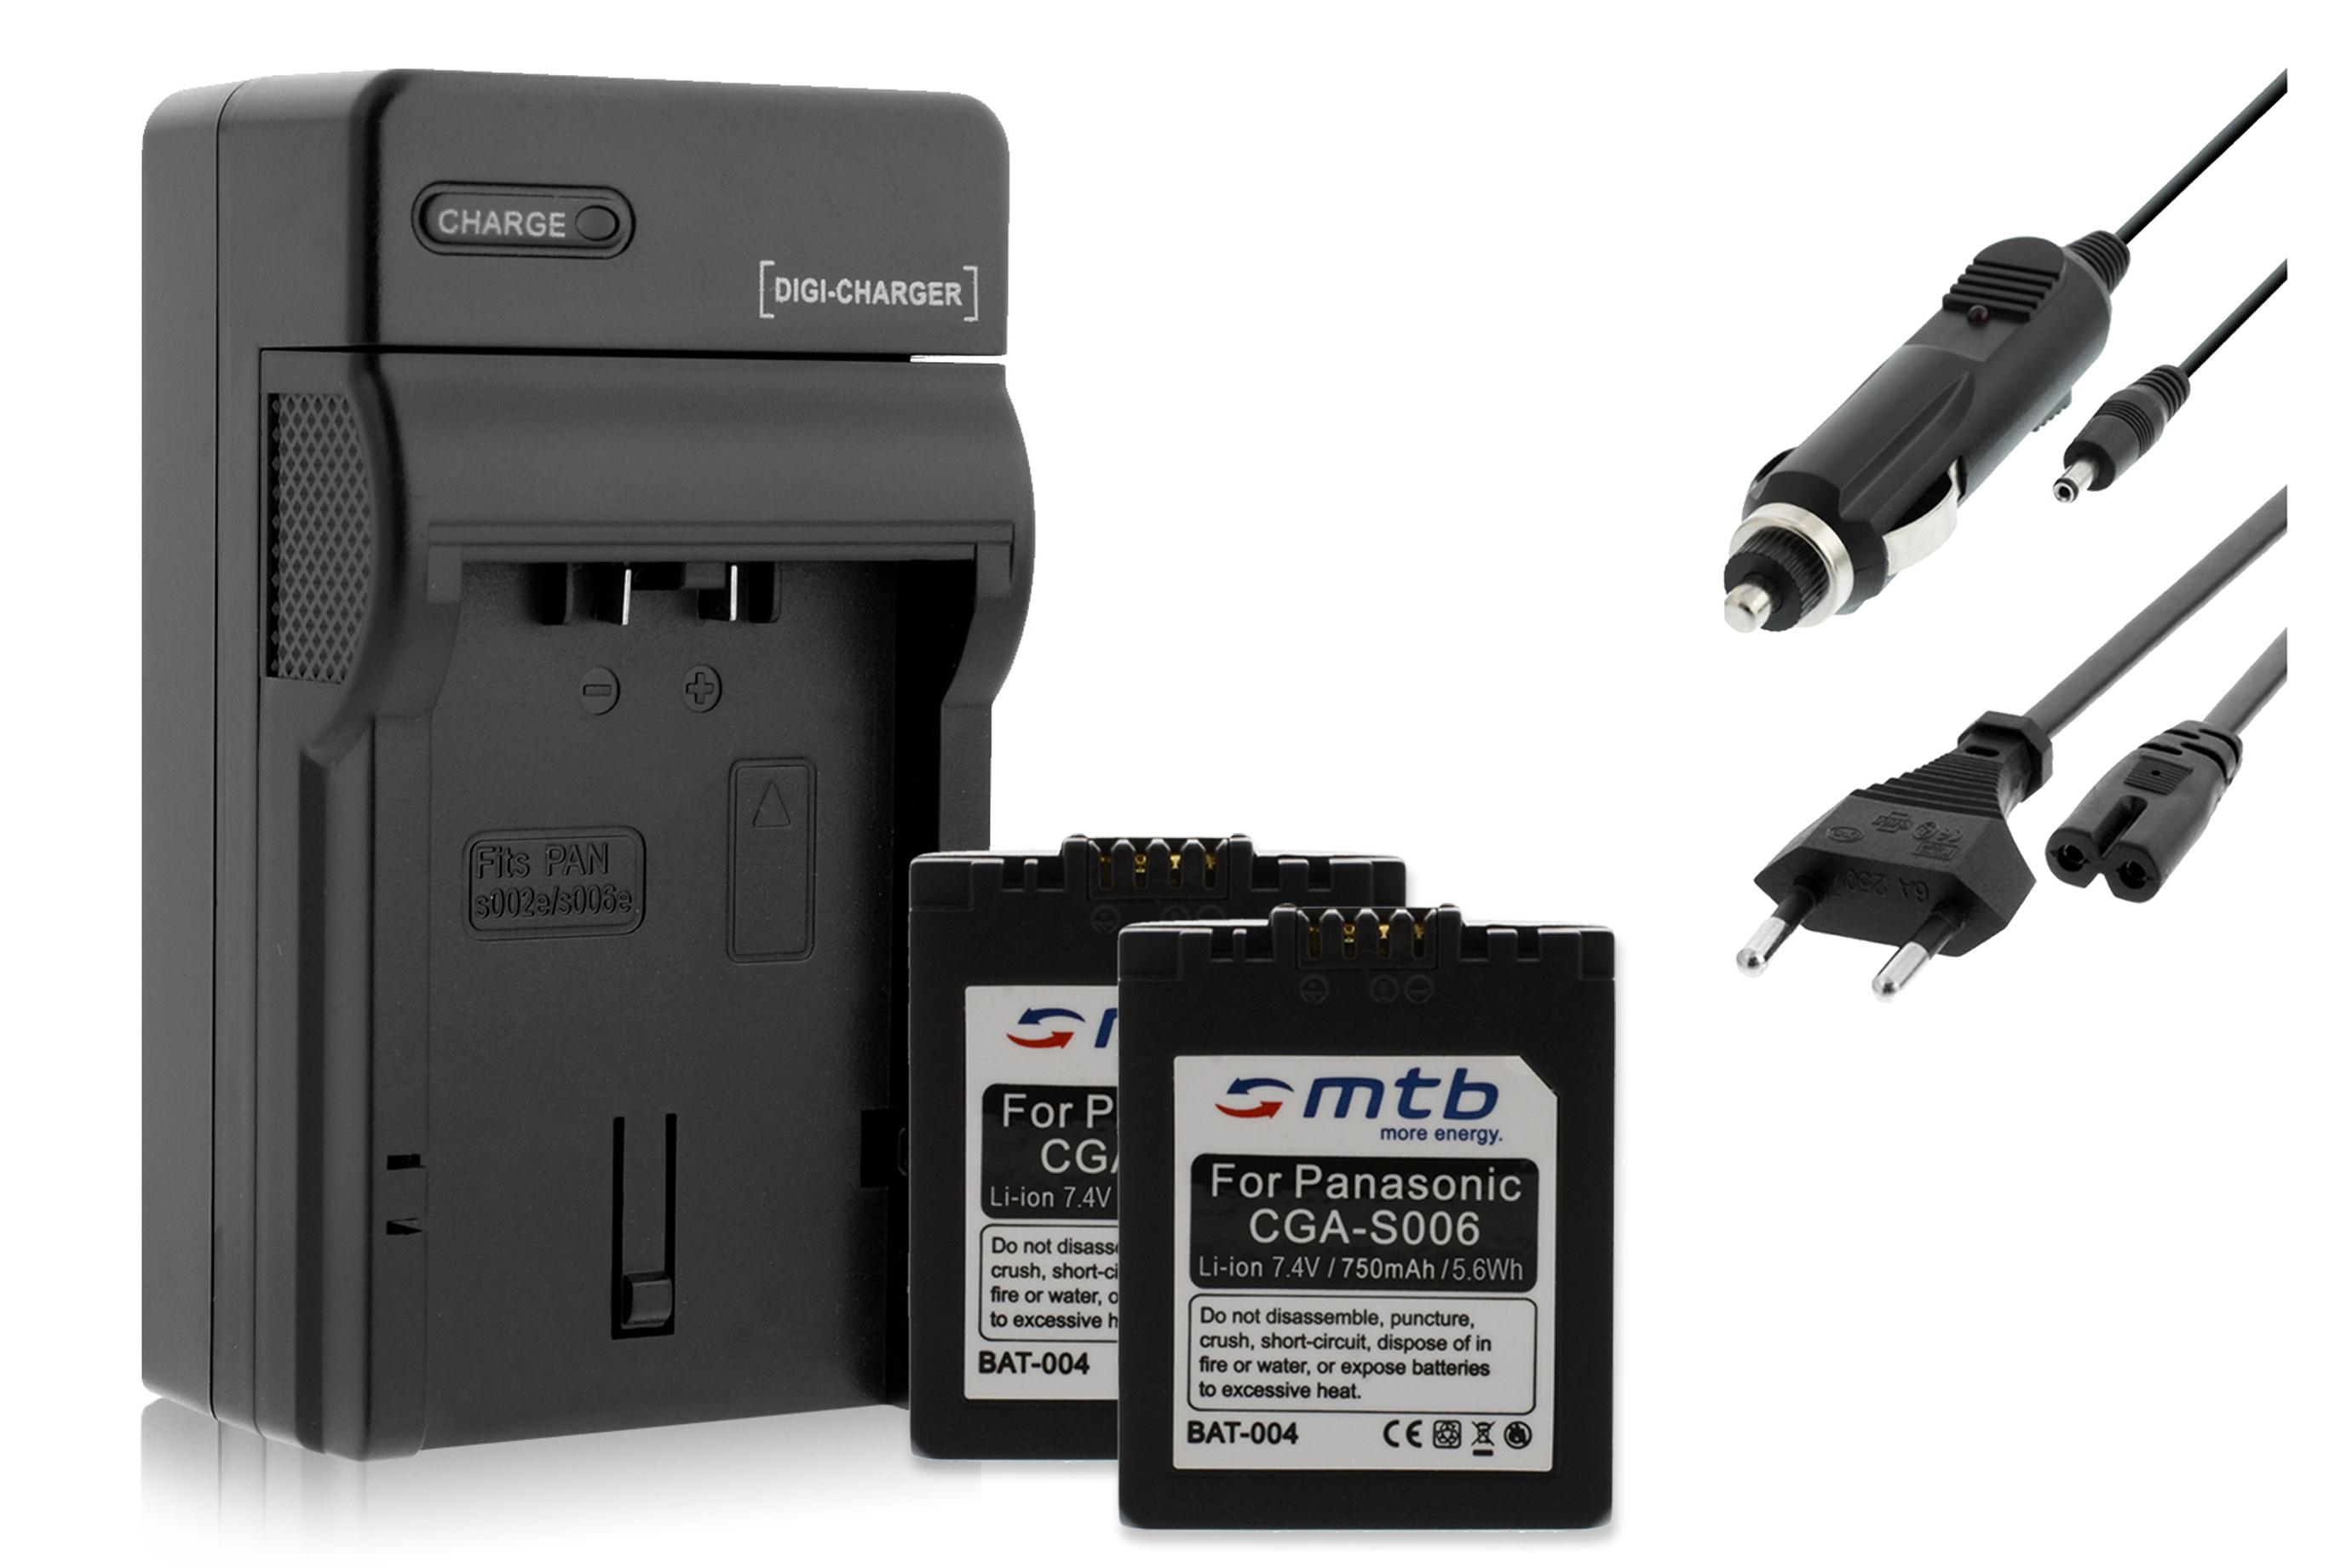 2x batteries cga s006 chargeur pour panasonic lumix dmc - Batterie panasonic lumix dmc fz18 ...